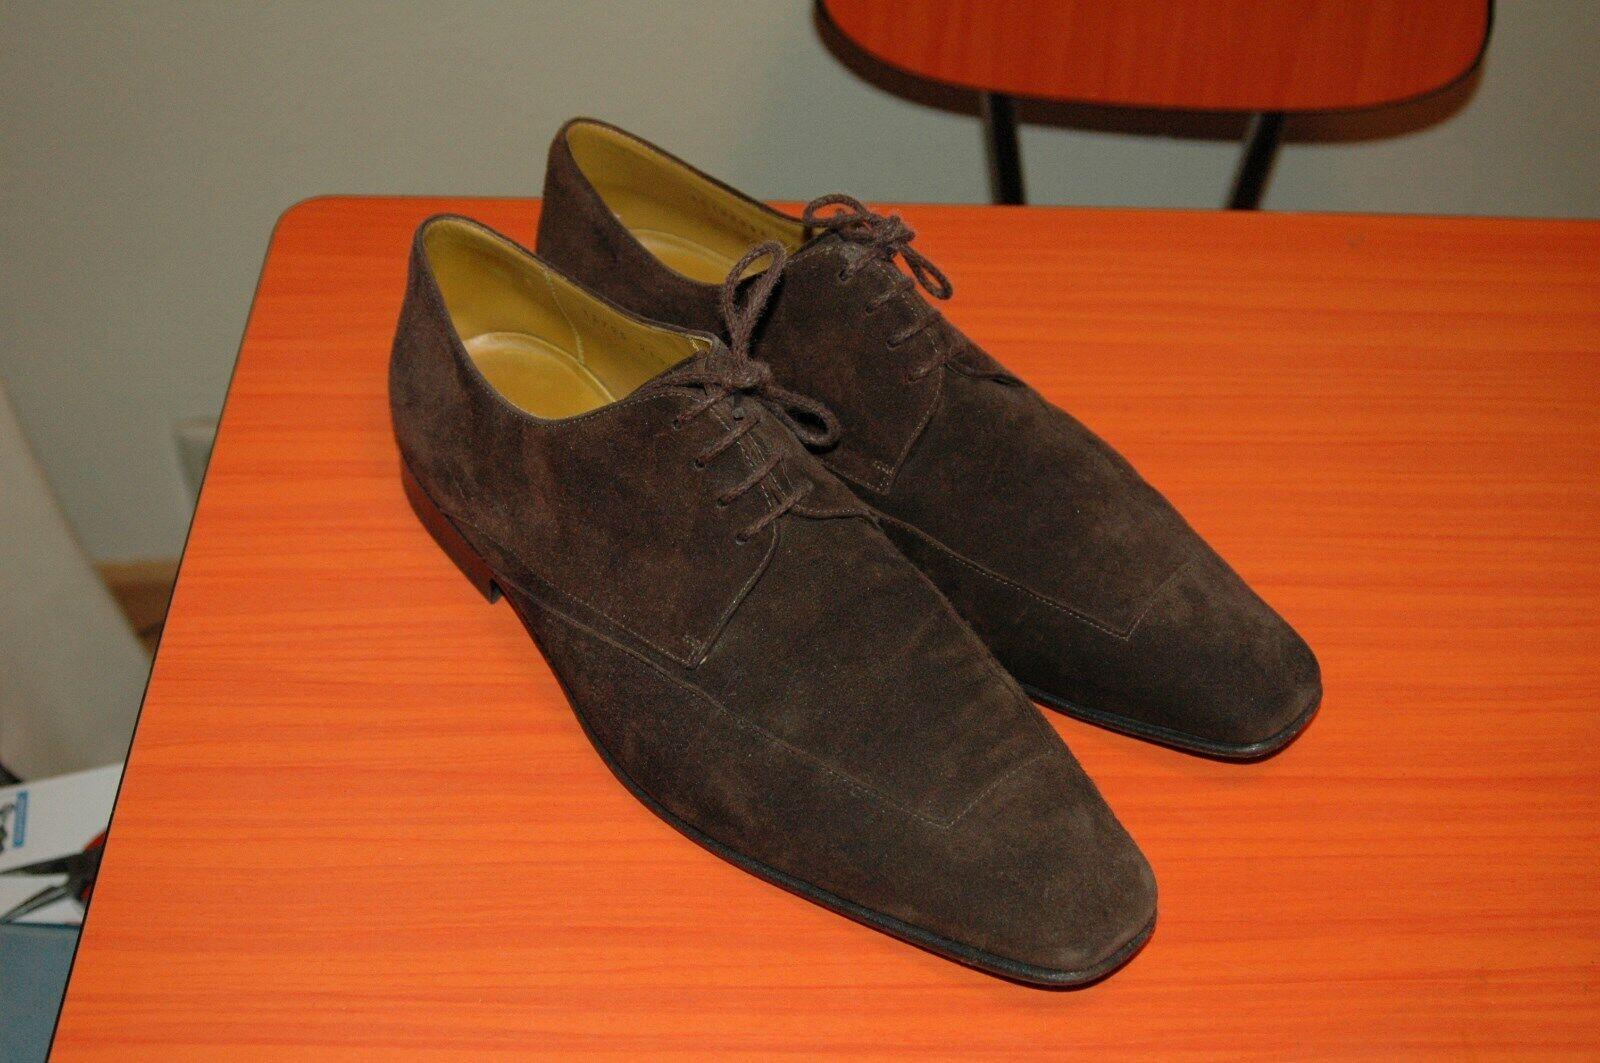 Zapatos De Vestir HUGO BOSS Selección Para Hombres Marrón con Cordones 43.5 nos 10.5 Italia